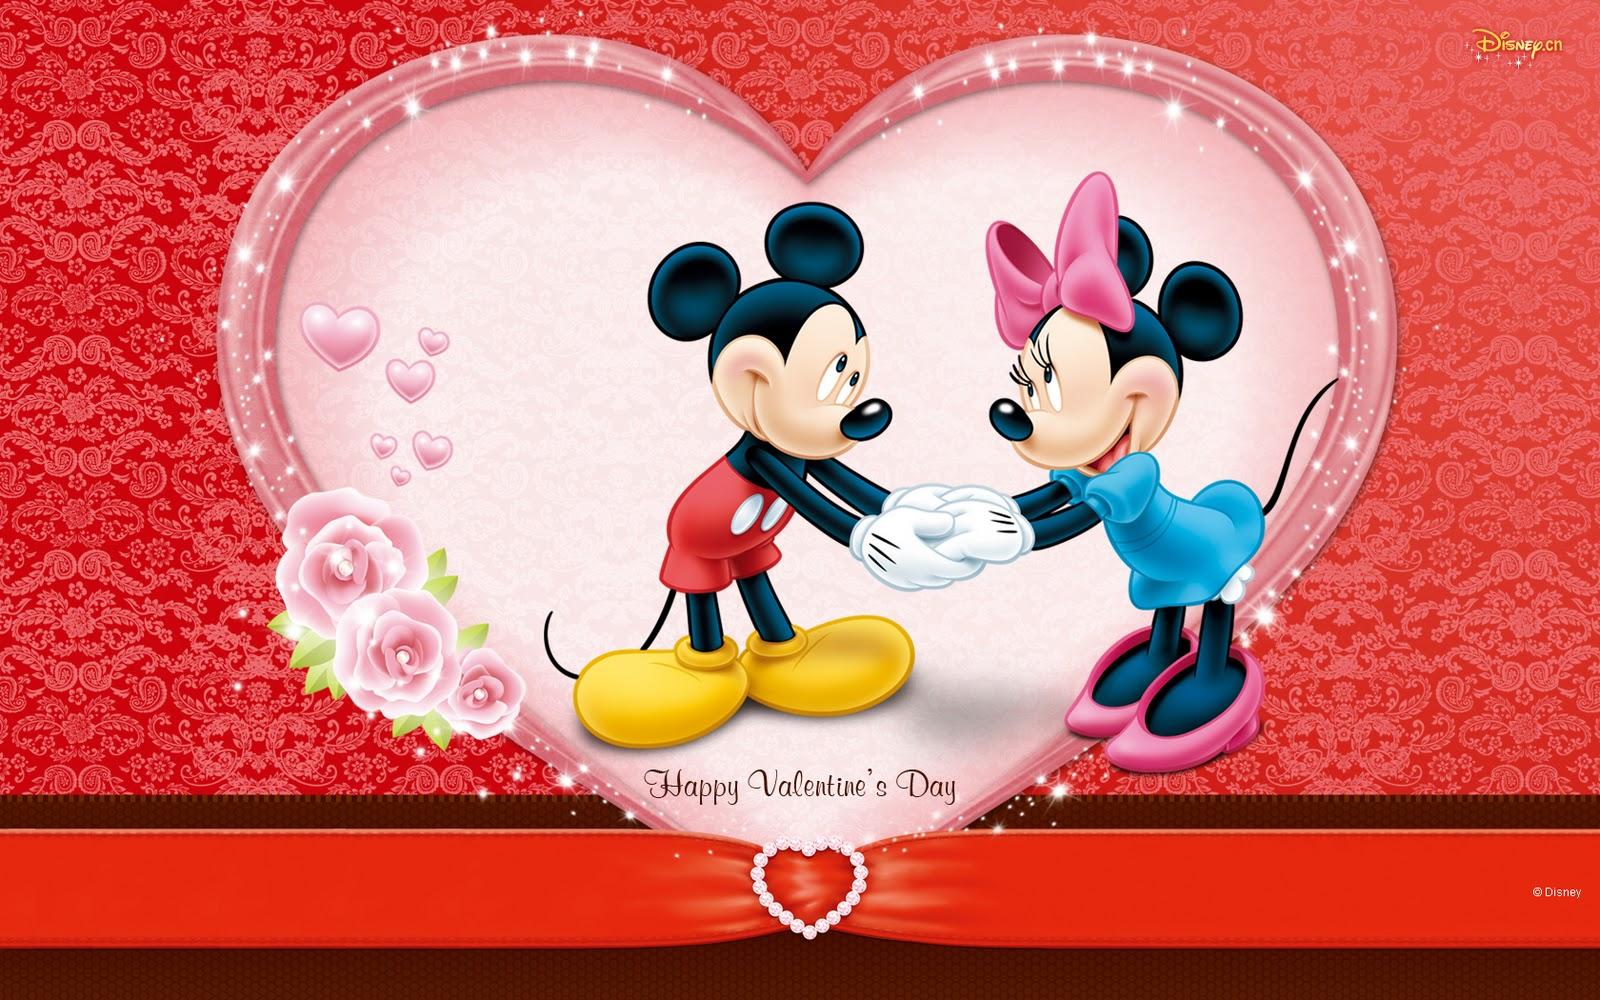 Disney Happy Valentiines Day Desktop Wallpaper Freejpg 1600x1000